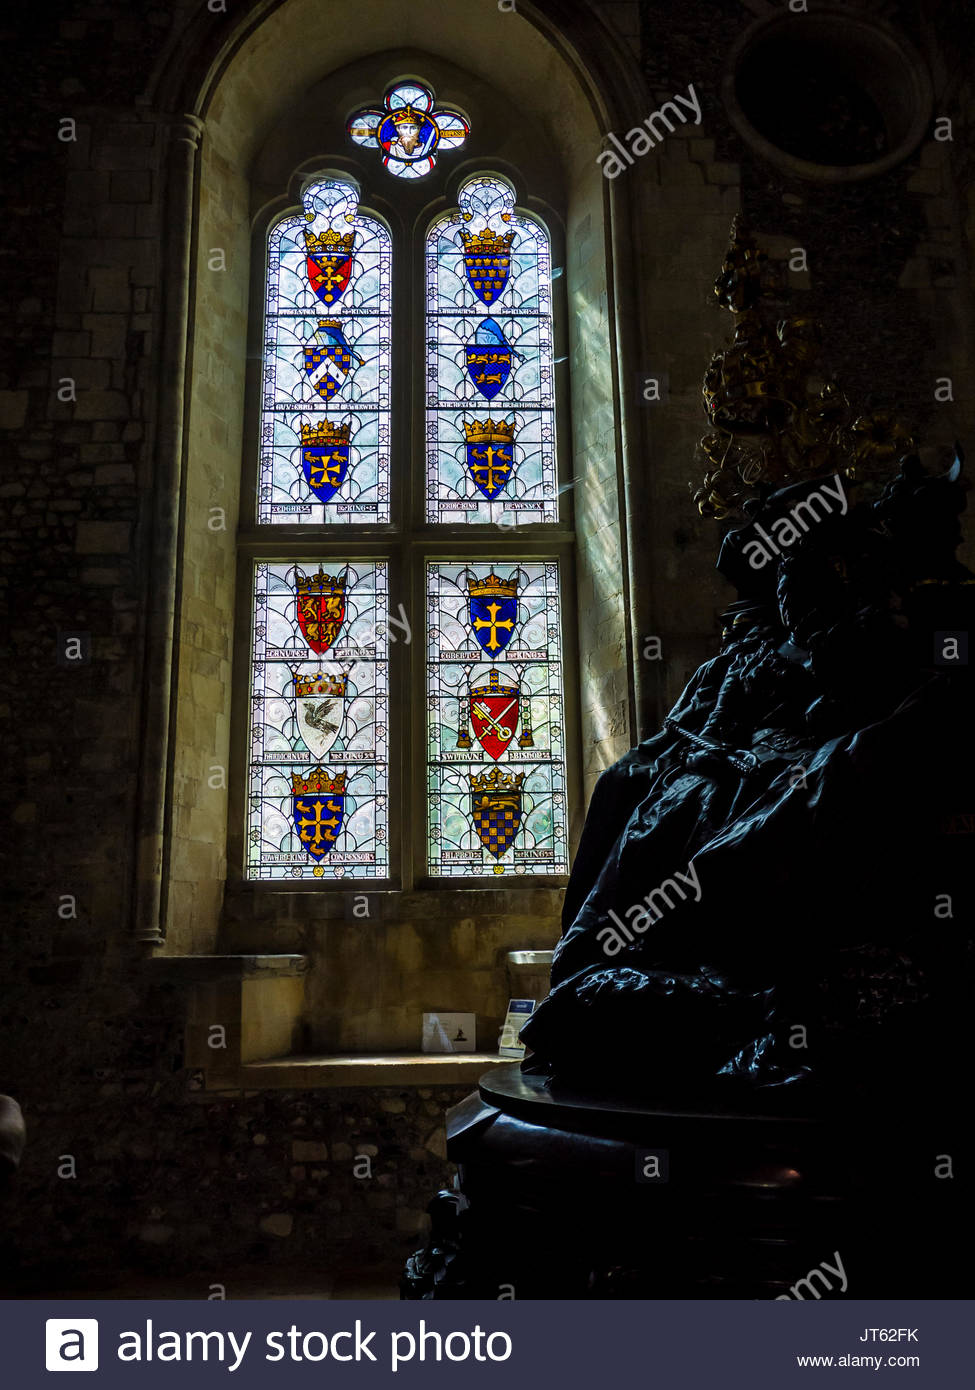 England, große, Halle, Hampshire, Königin Victoria, Stain Glass Window, Thron, Winchester Stockbild